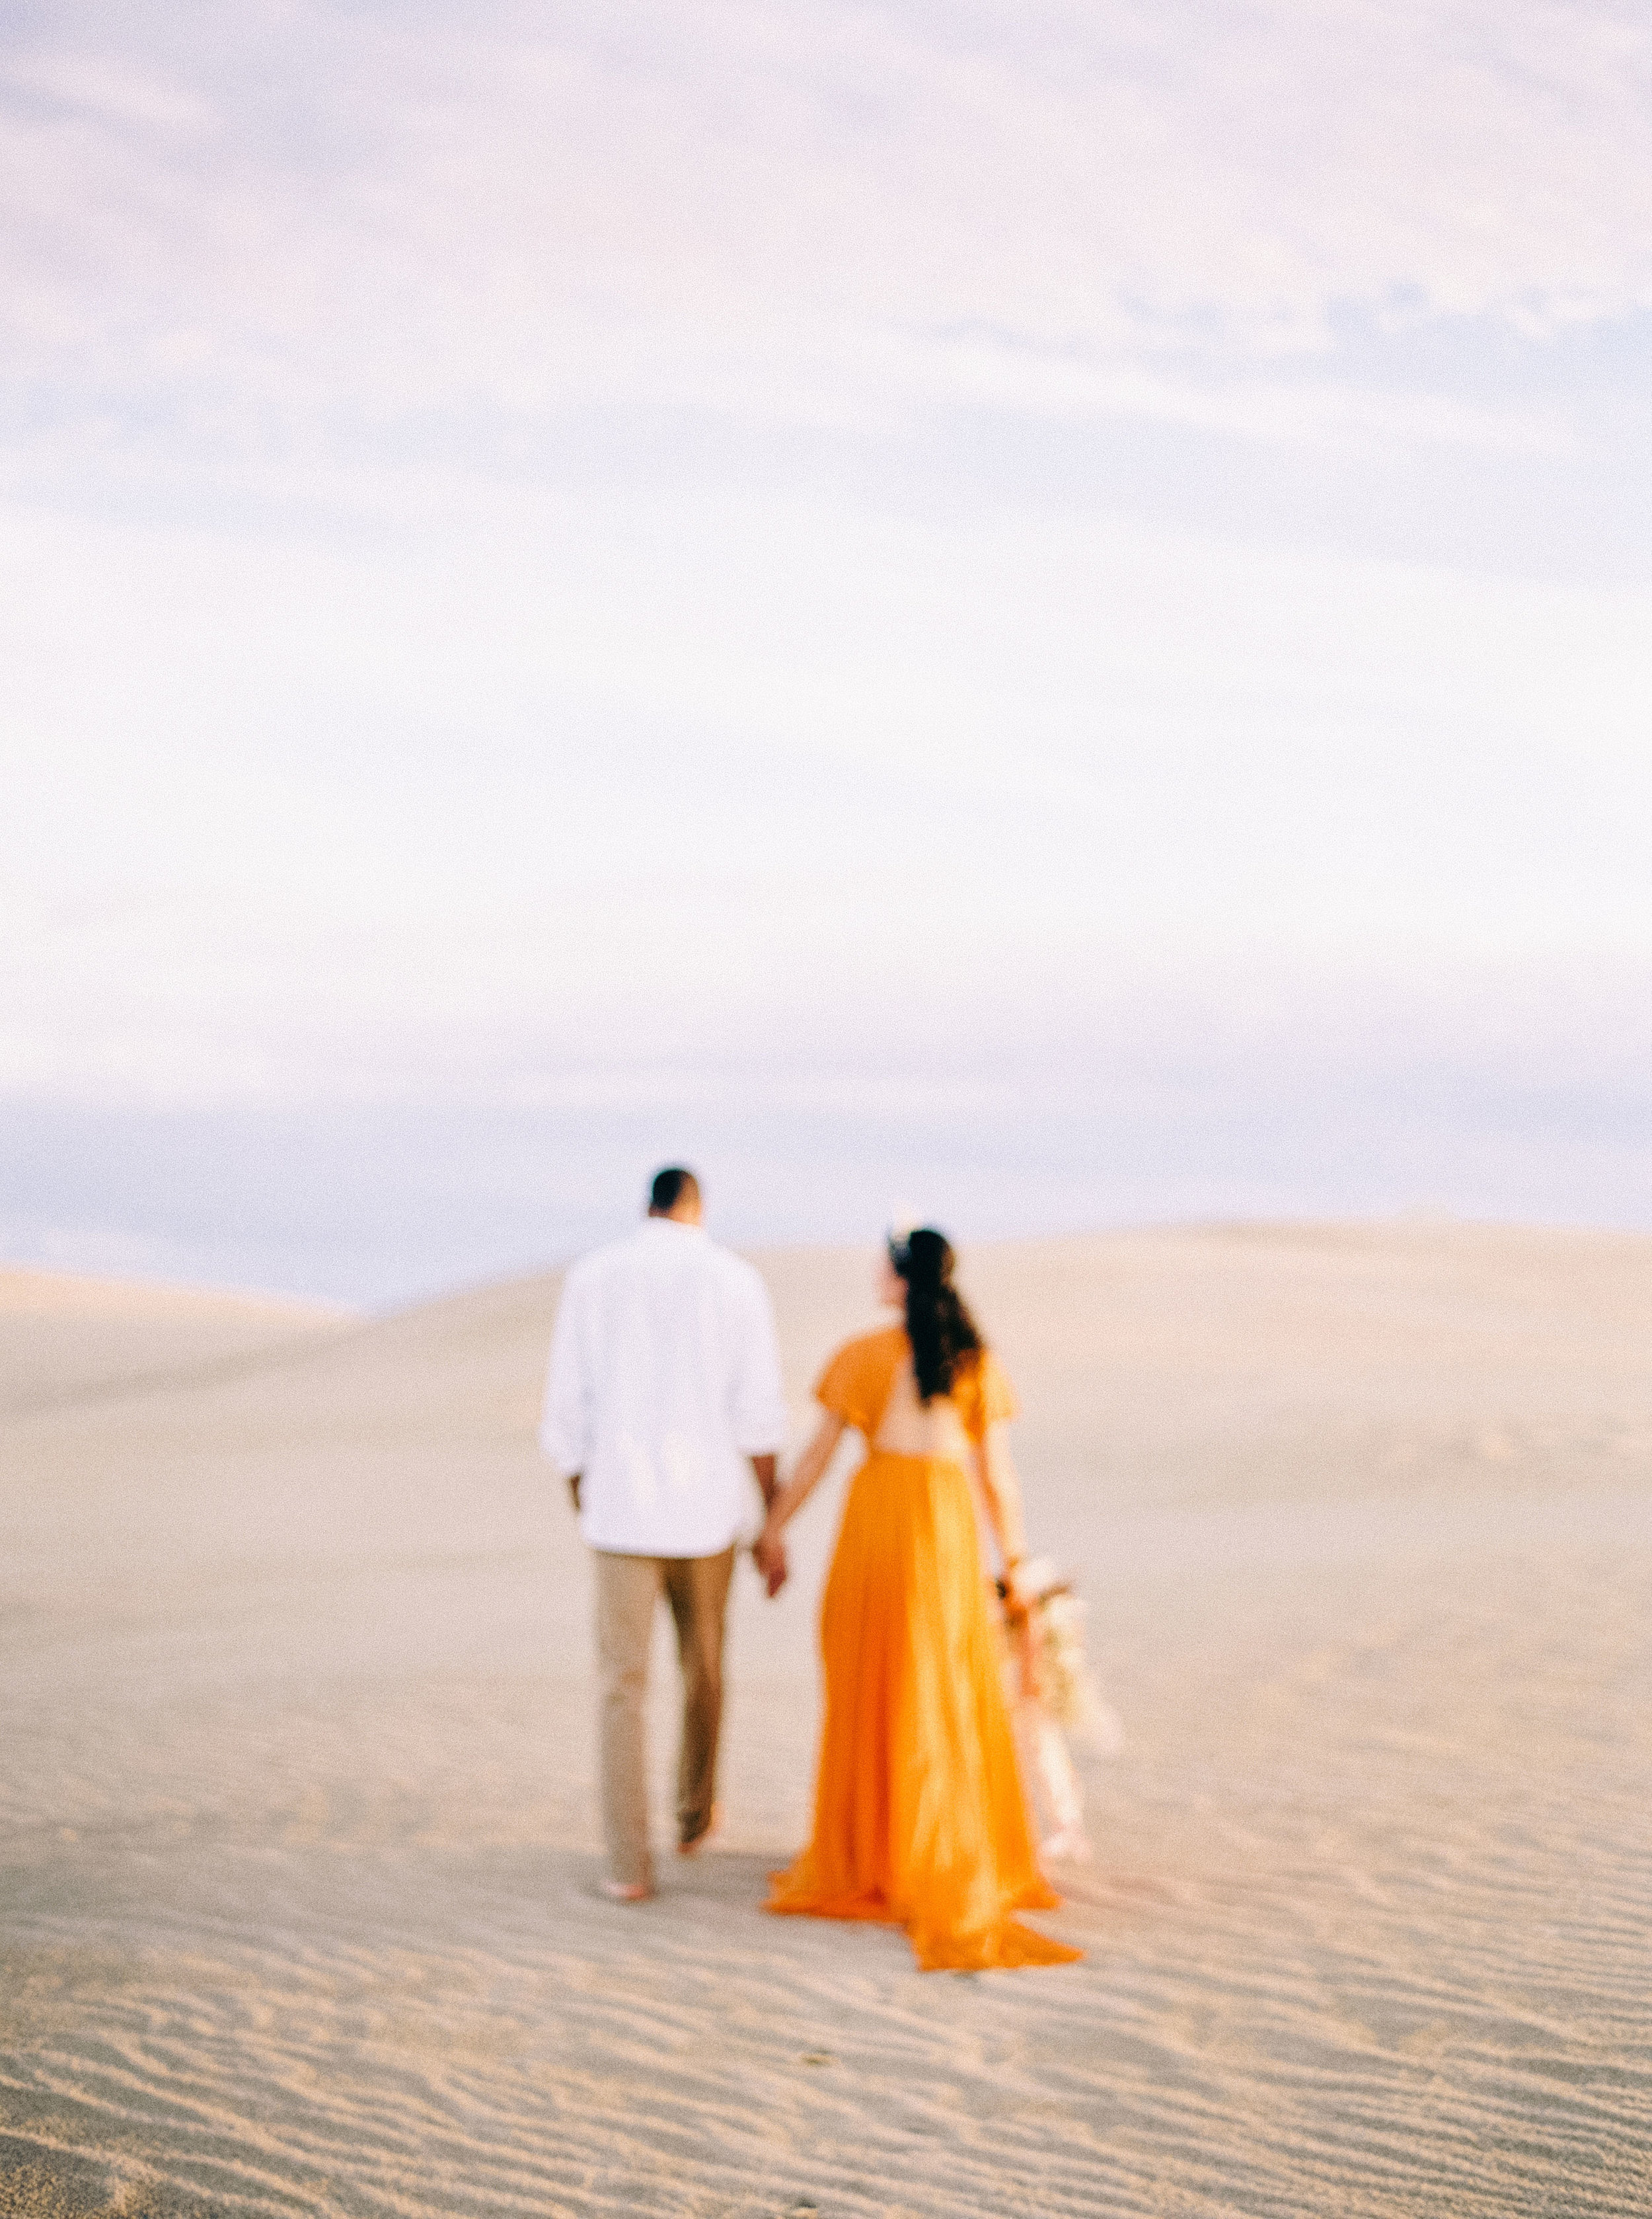 NikkiSanterre_FineArtFilmWeddingPhotographer_WeddingSparrowEditorial_AisleSociety_DesertEngagementSession-10.jpg